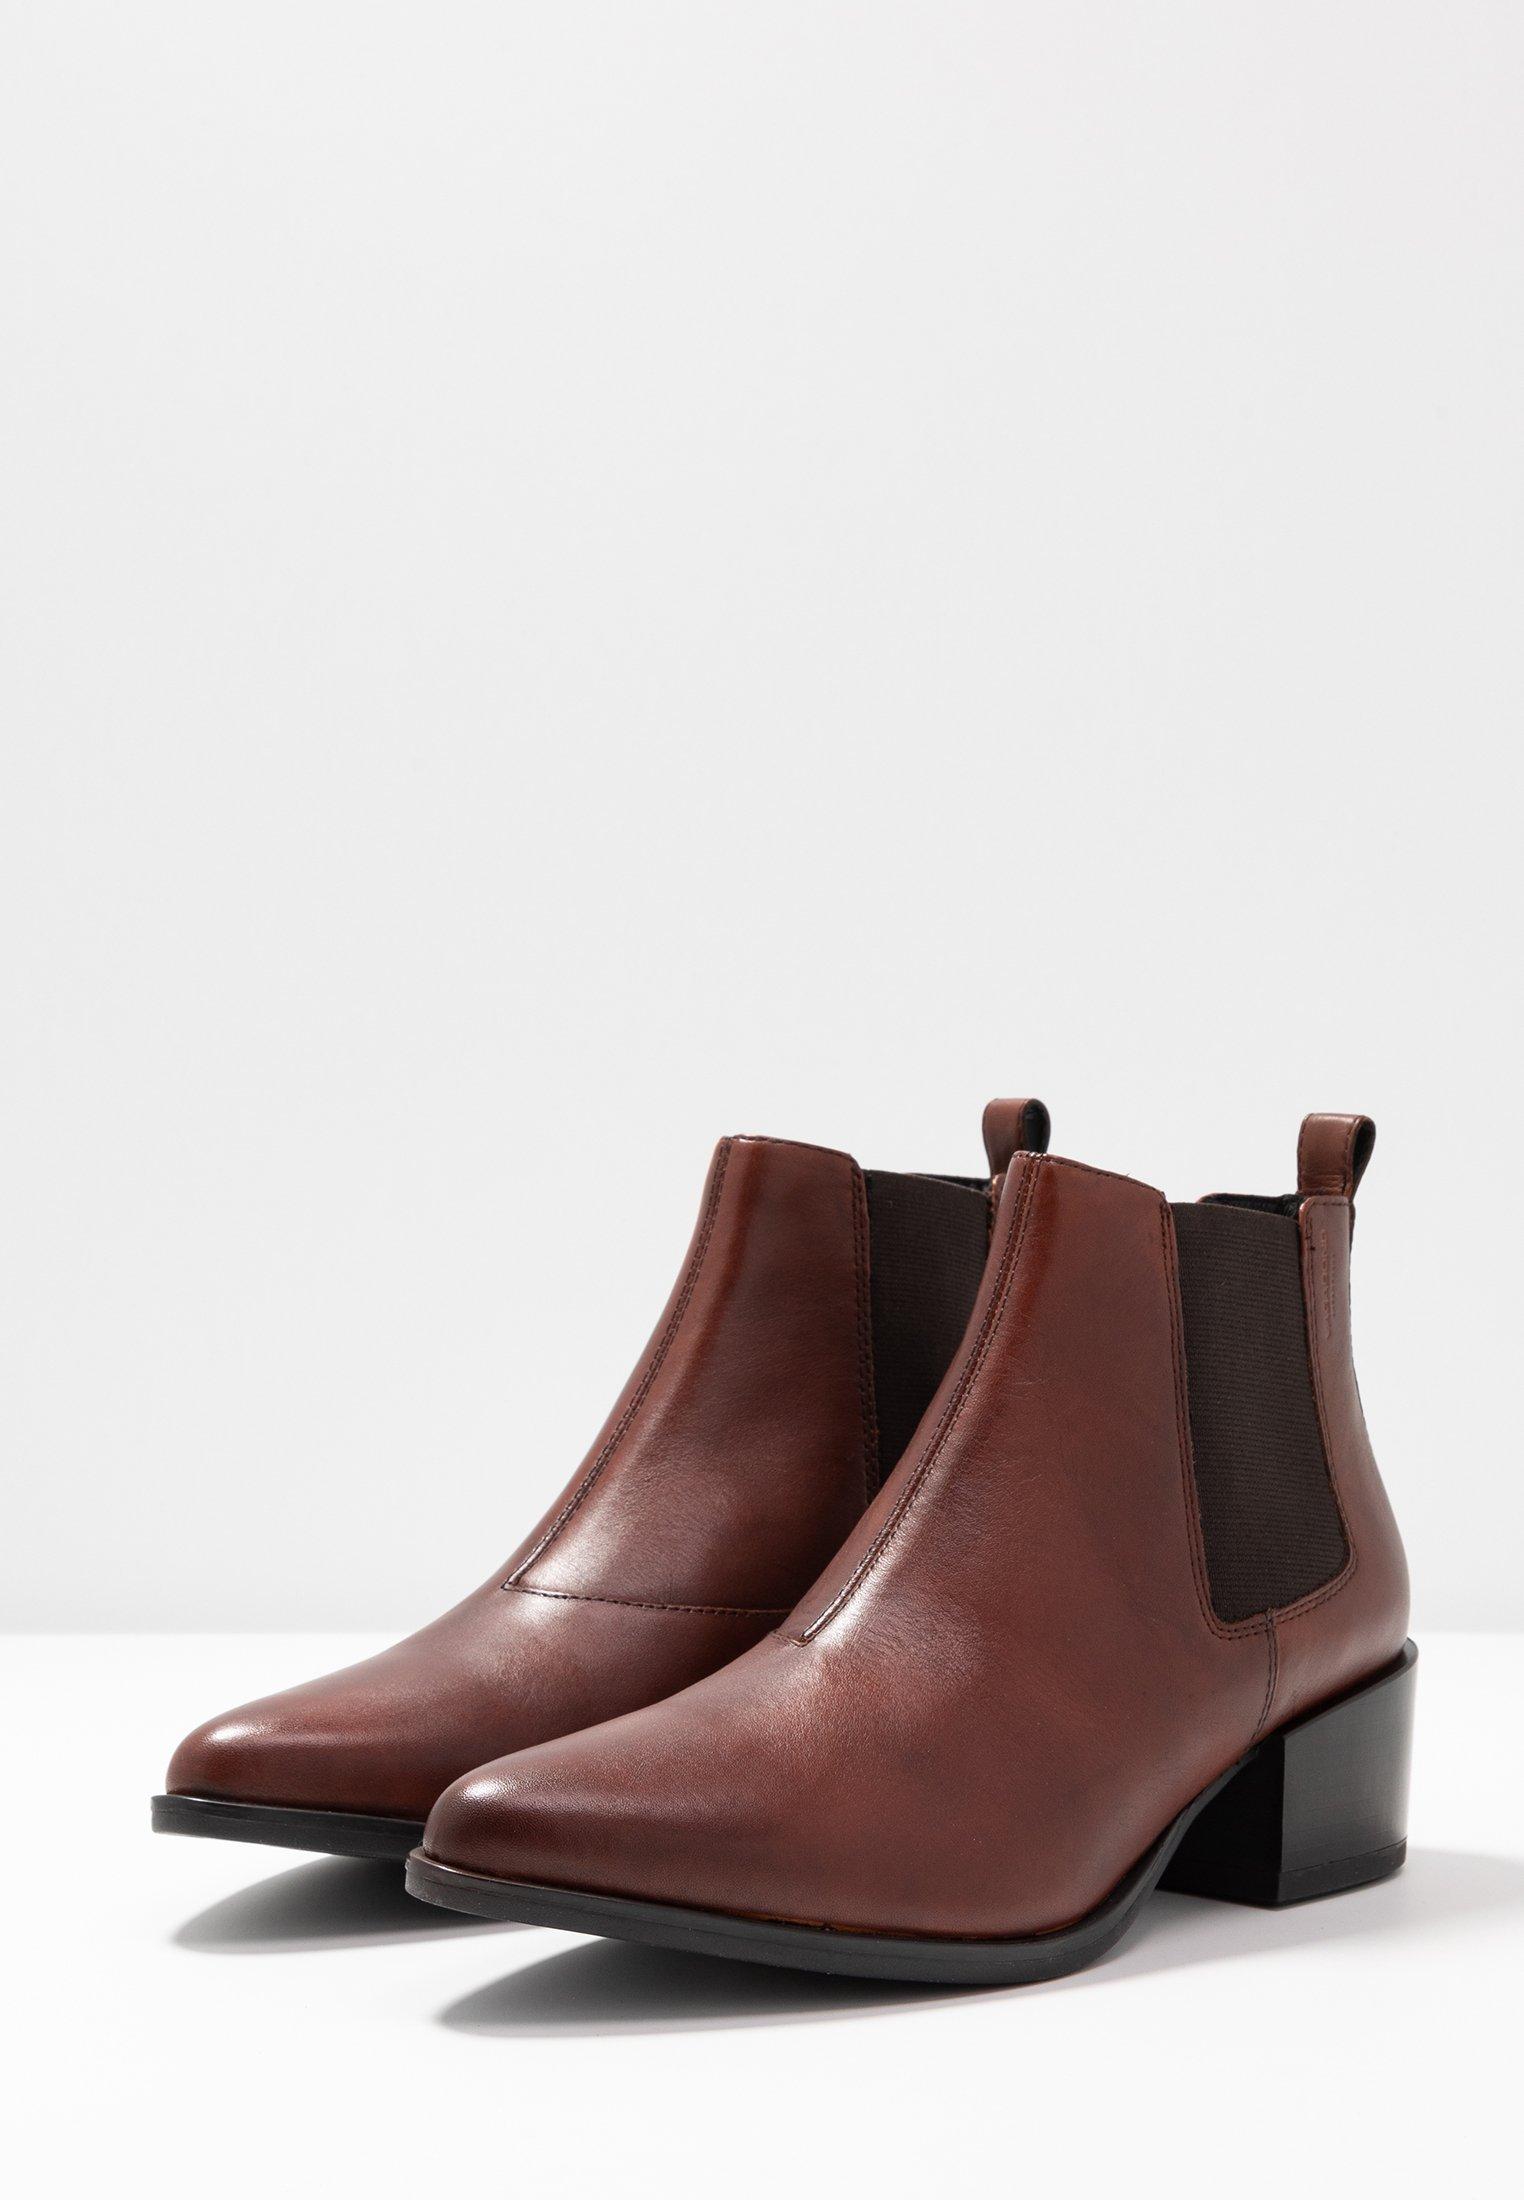 Vagabond MARJA Ankle Boot brandy/braun